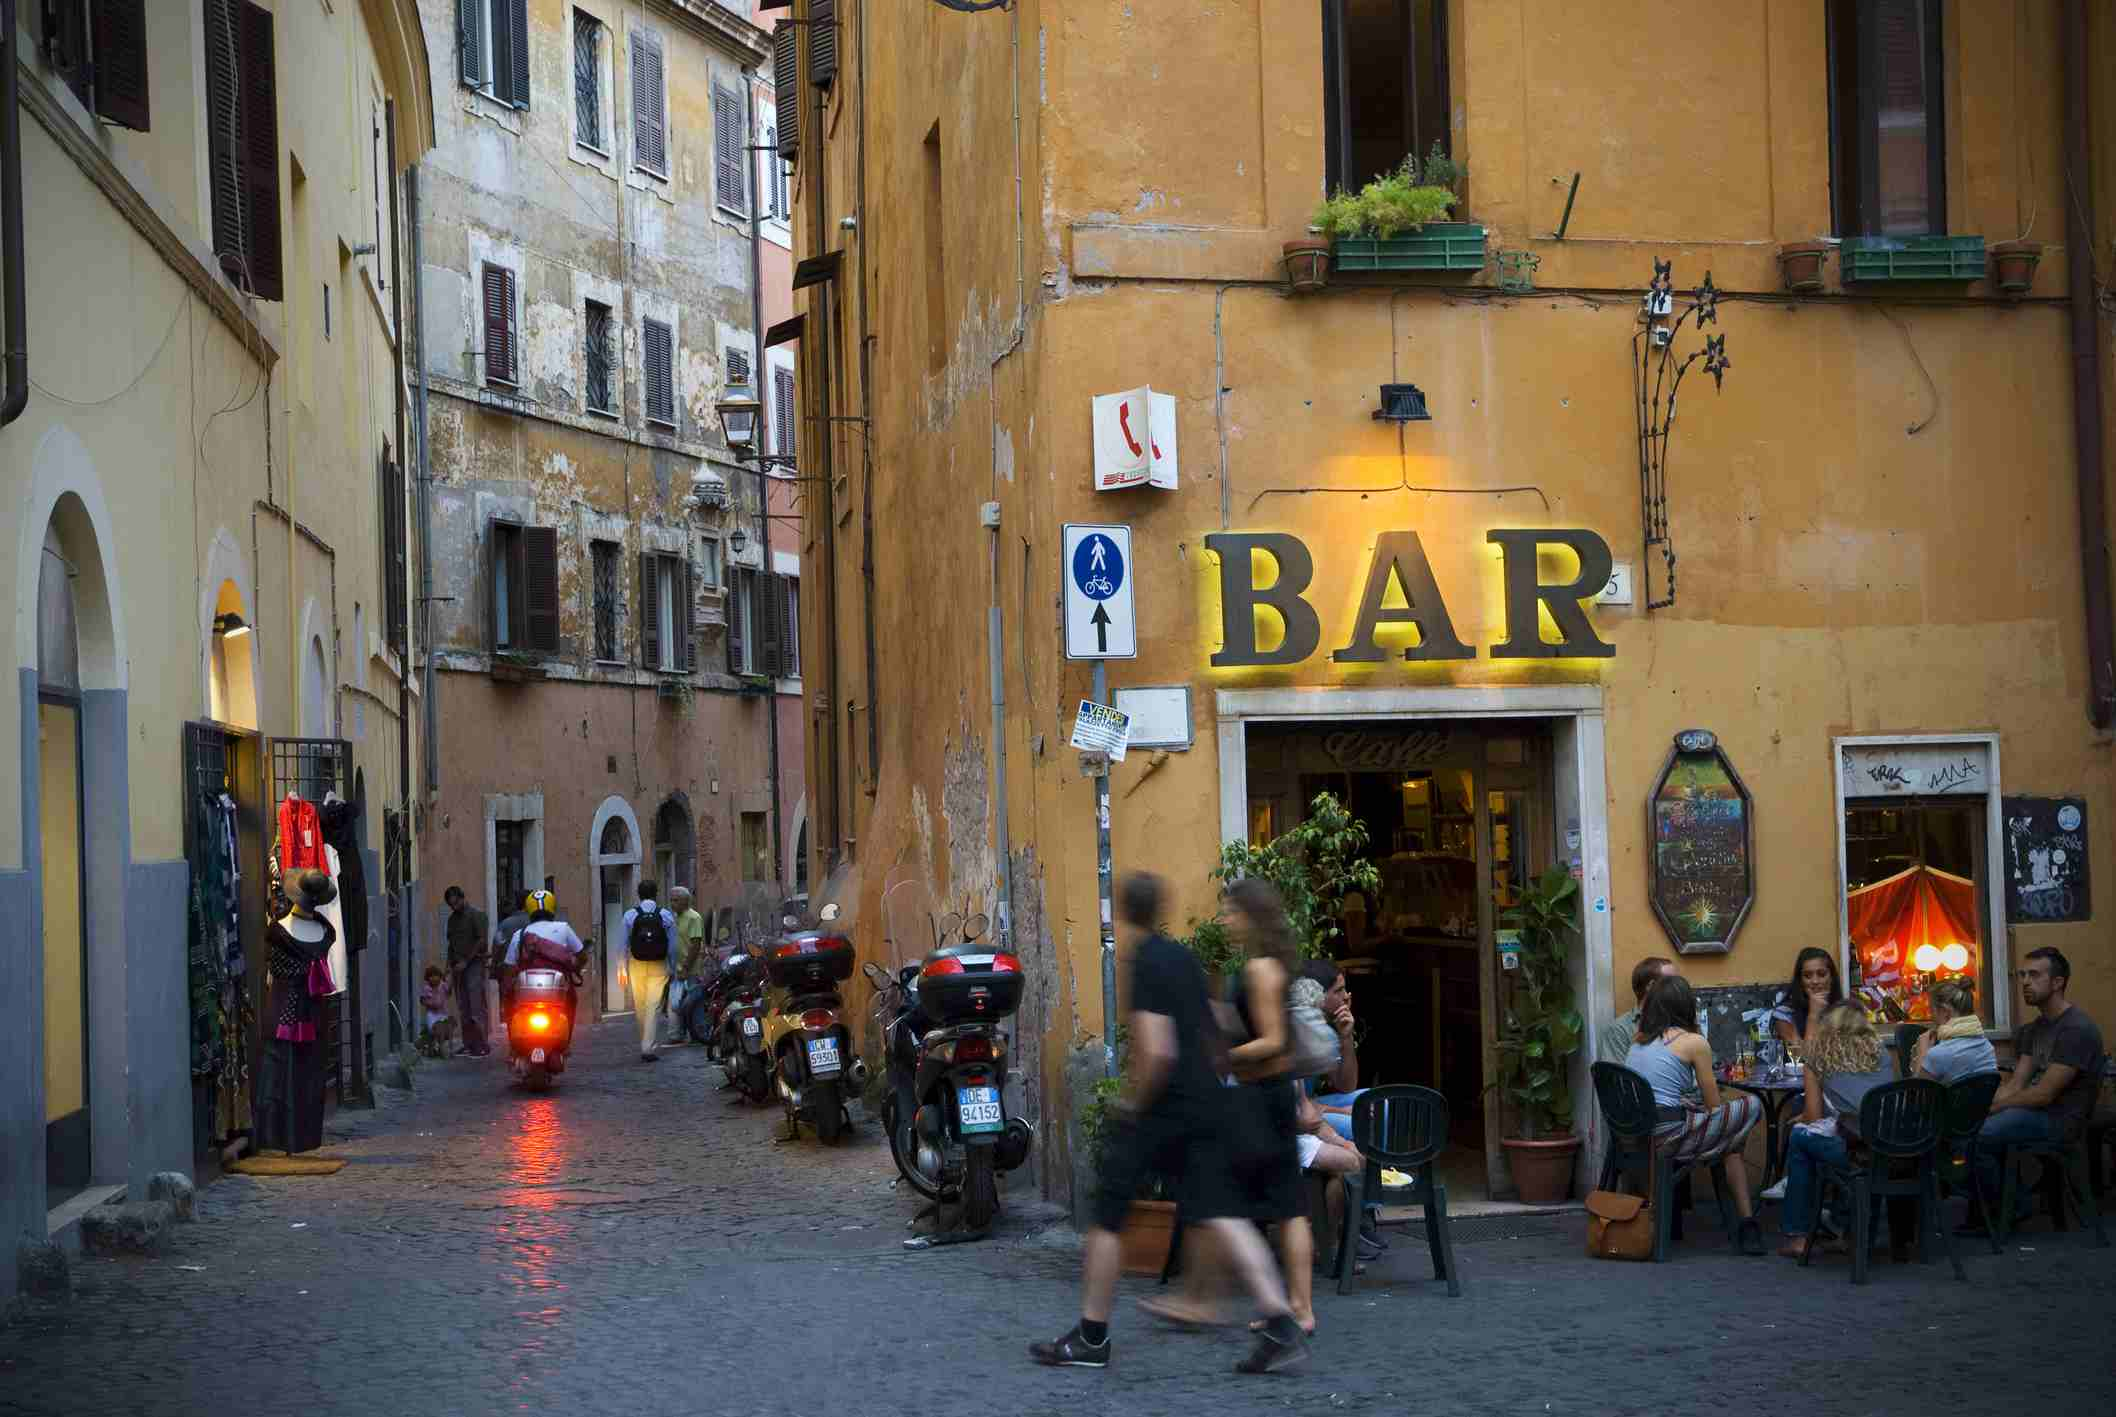 Walking in Trastevere